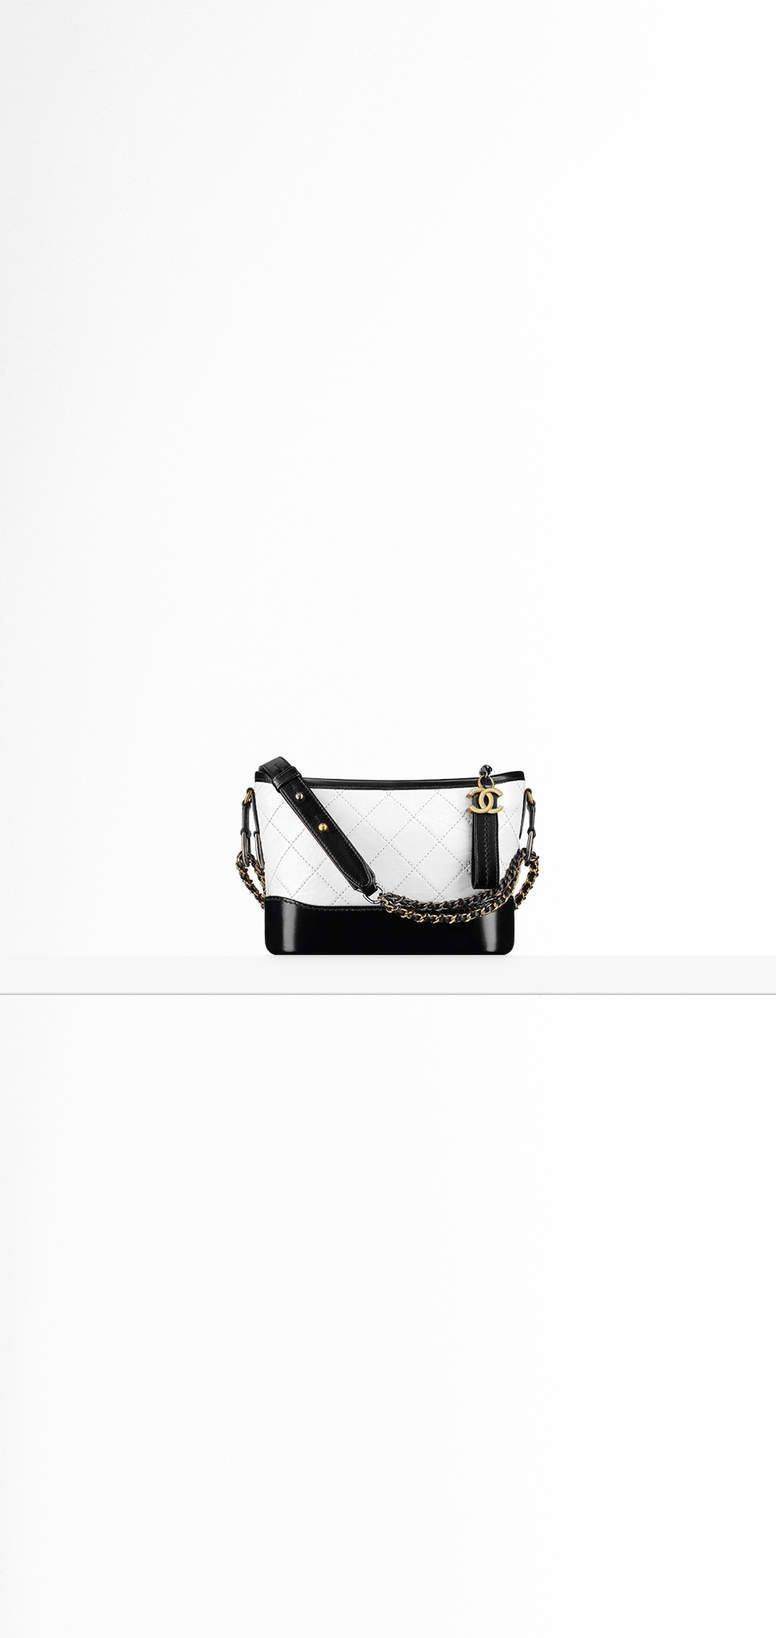 CHANEL'sGABRIELLE small hobo bag, aged calfskin, smooth calfskin, silver-tone & gold-tone metal-beige & black - CHANEL